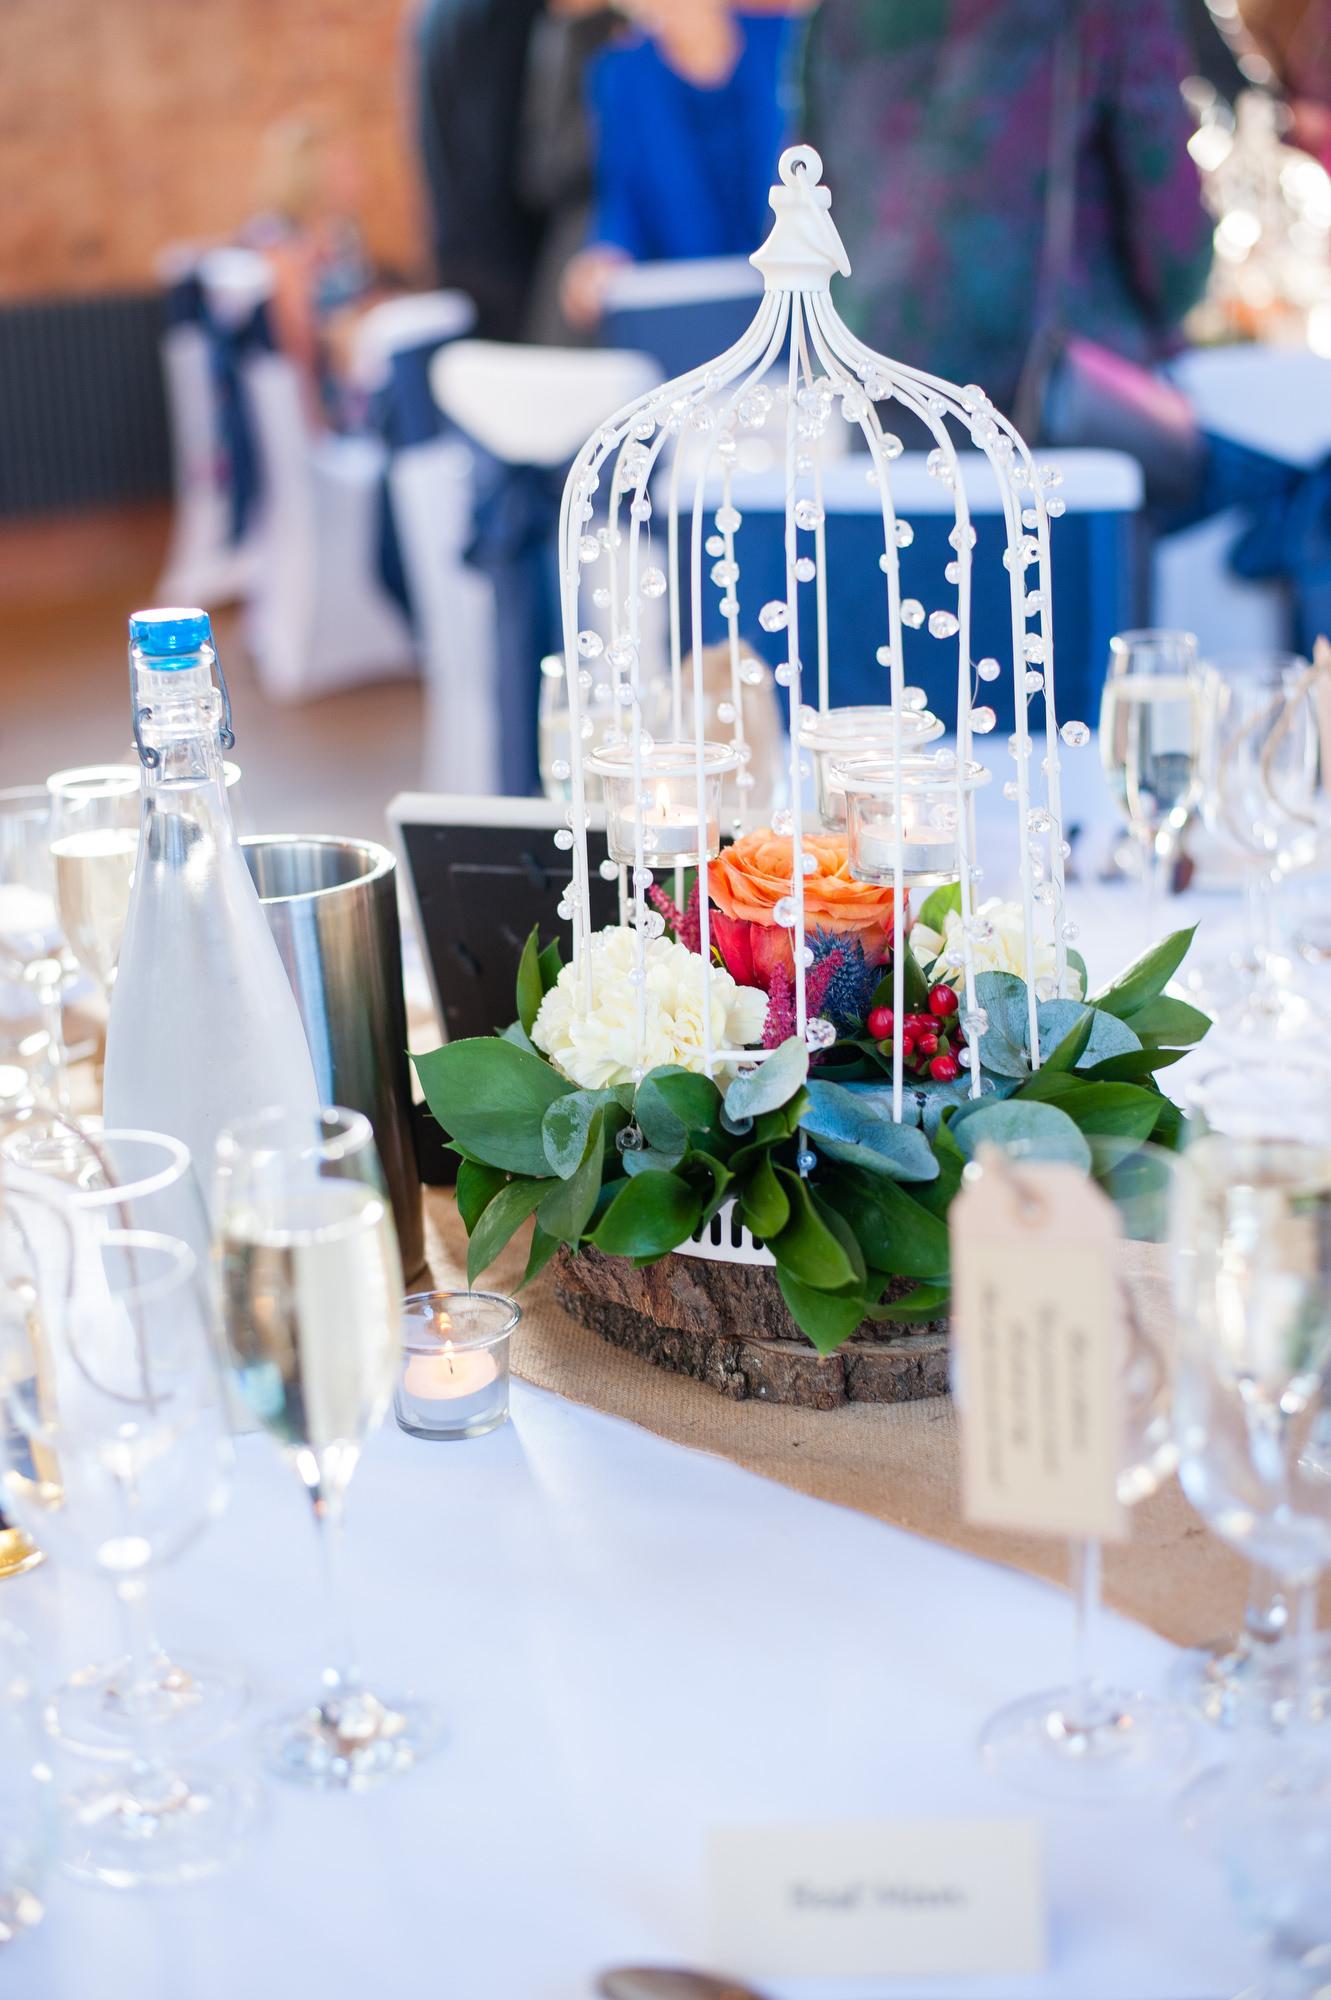 Geoff-Kirby-photography-Carriage-Hall-wedding0088